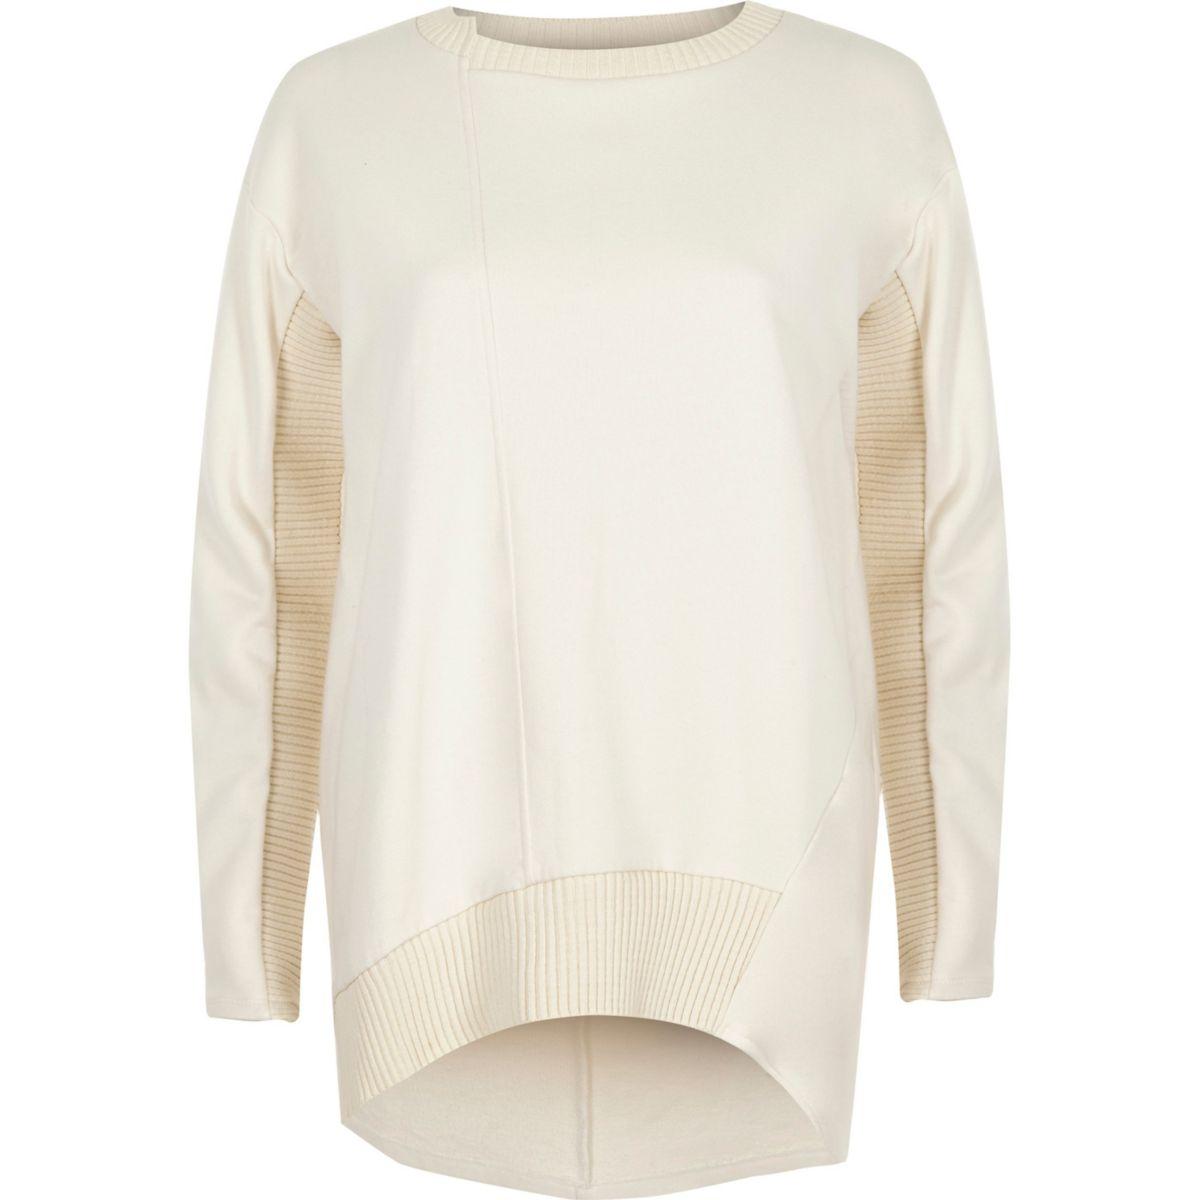 Cream long sleeve ribbed detail sweatshirt